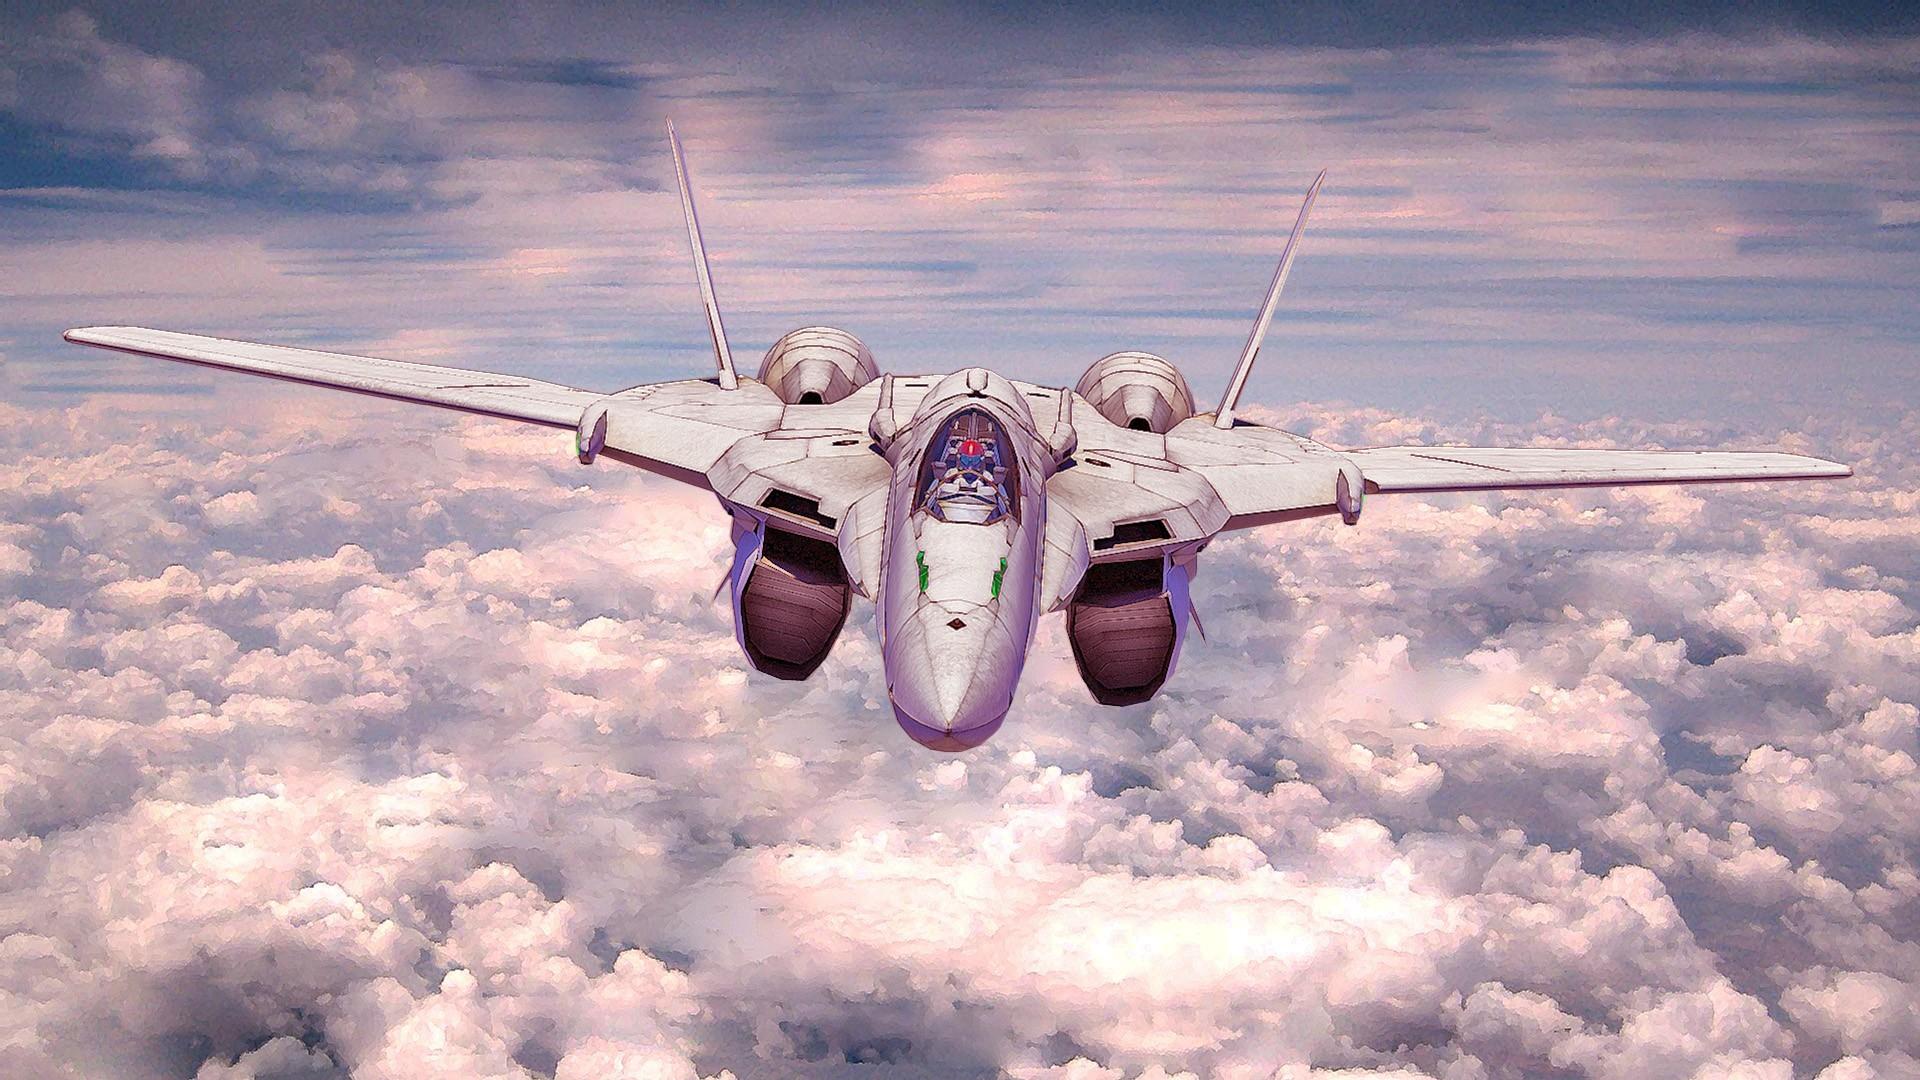 macross | Macross Frontier jet plane | Sky Wallpapers